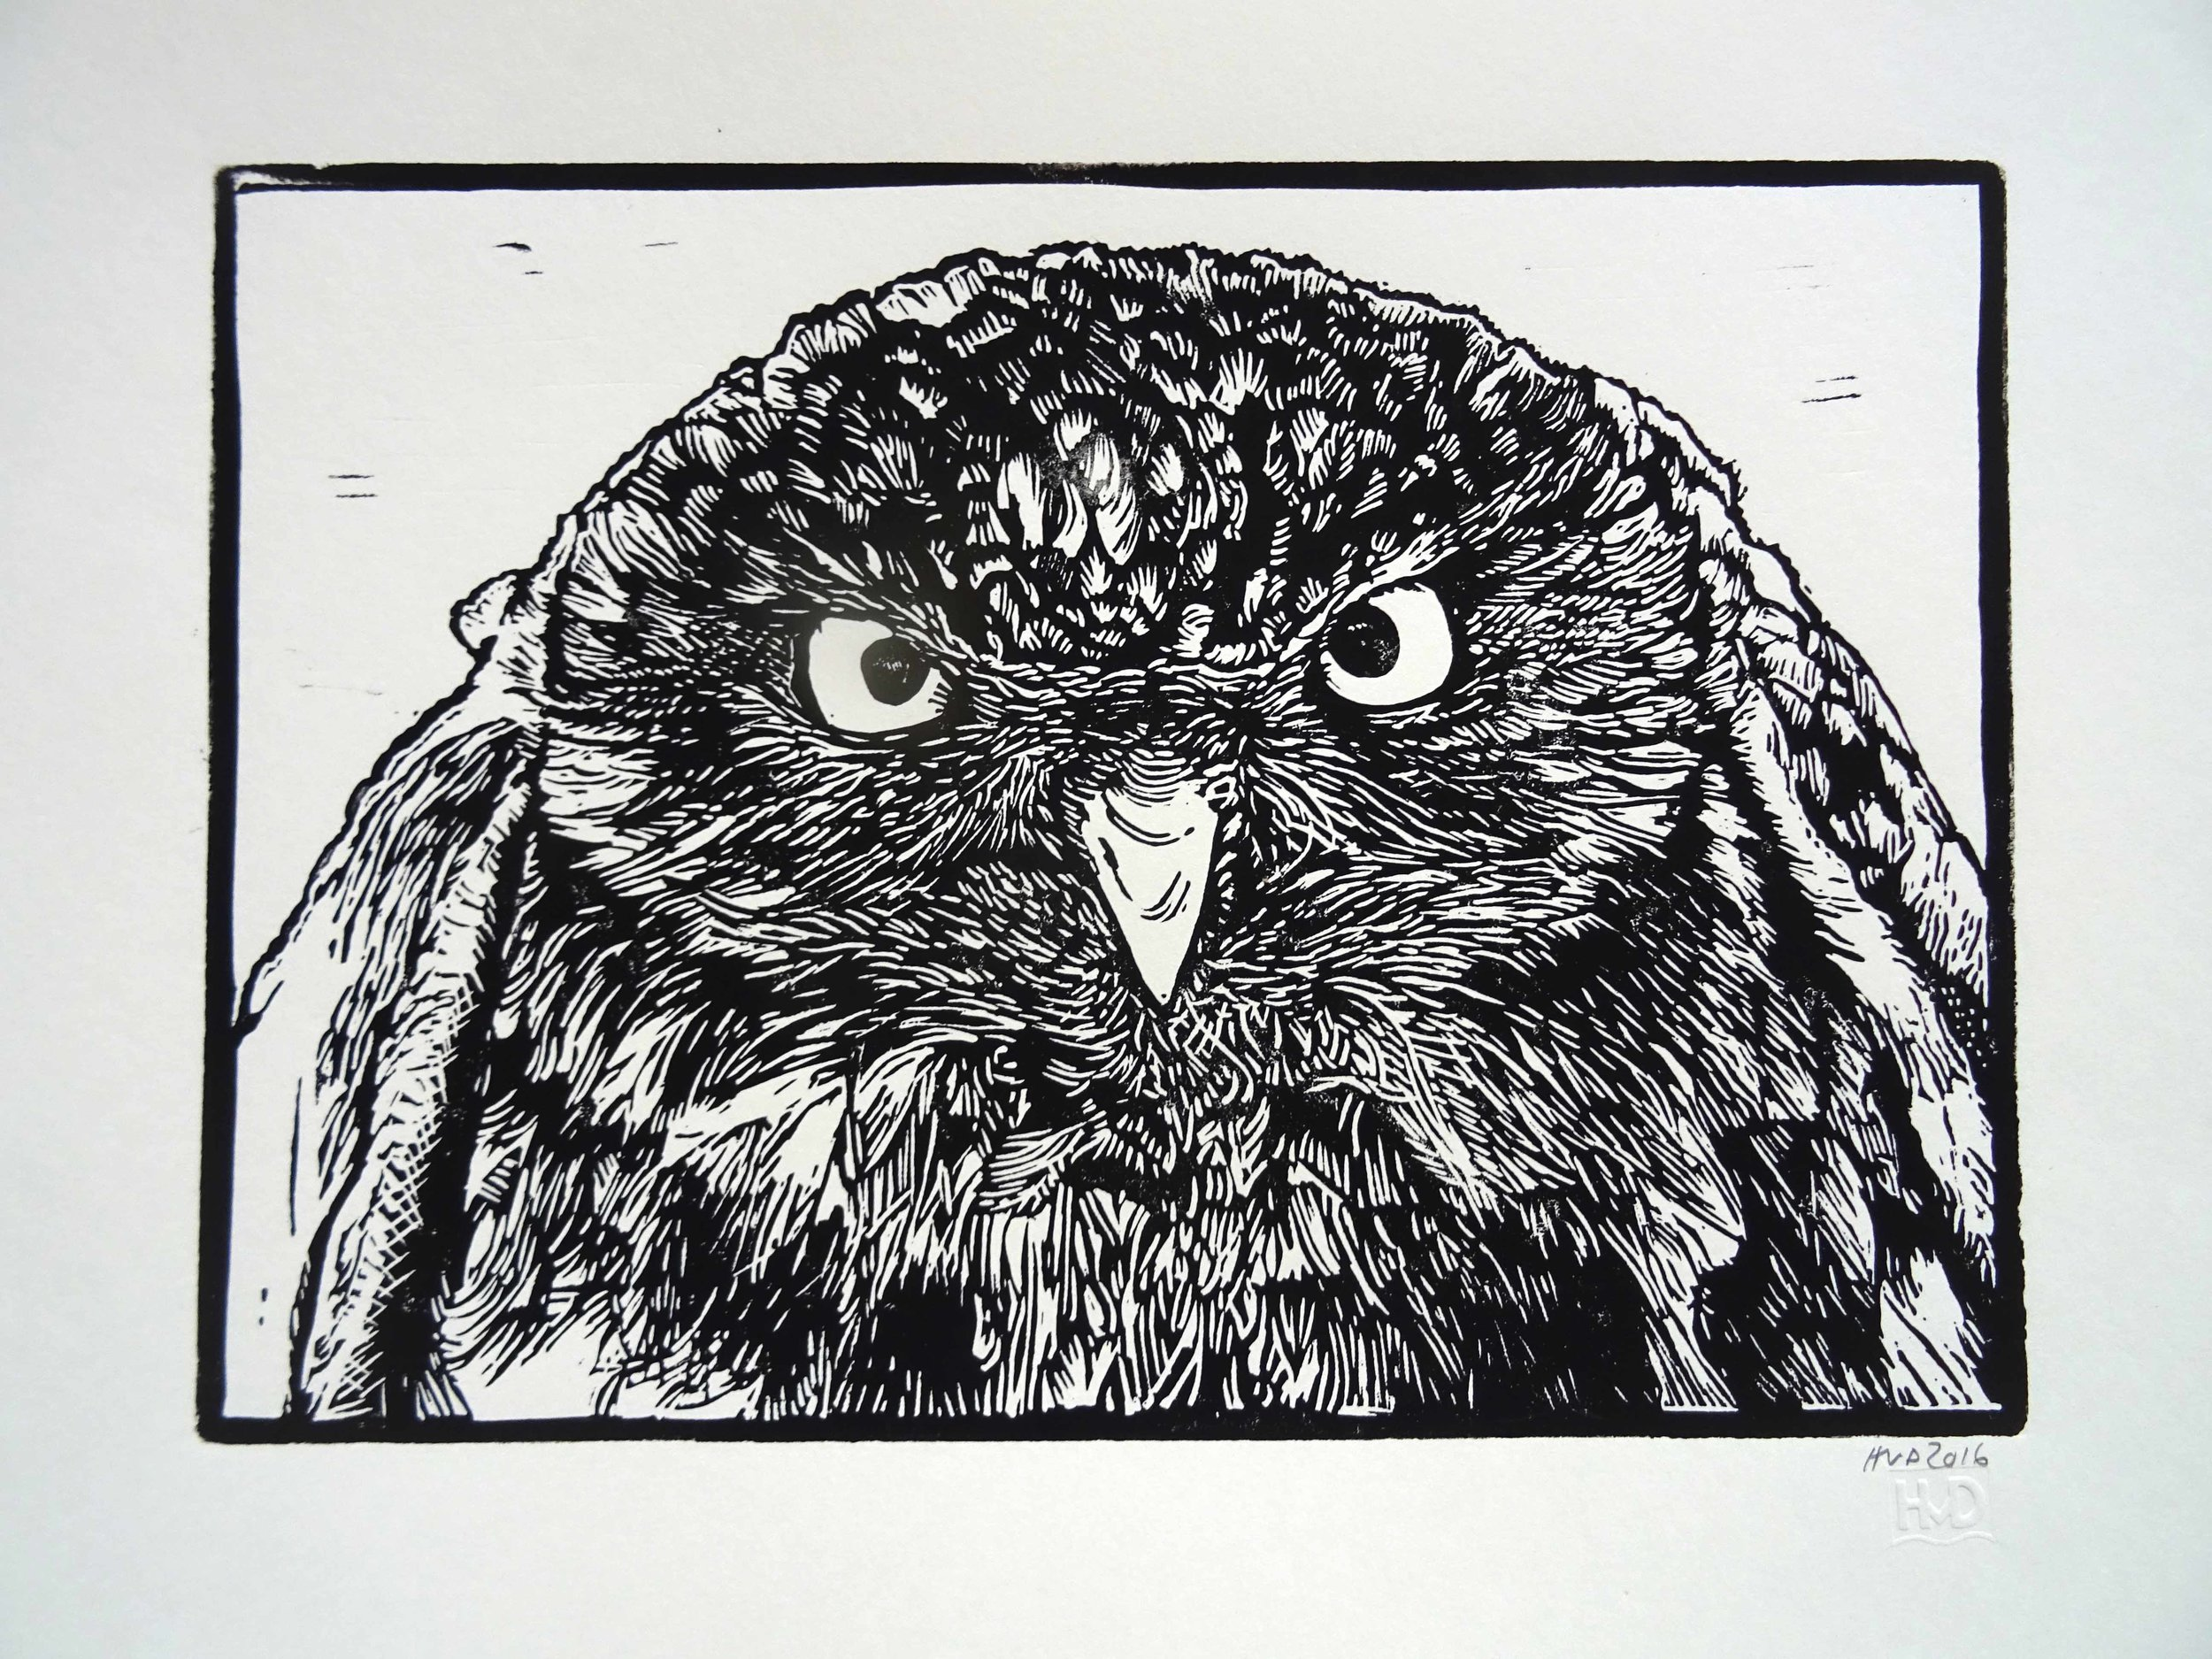 198 - Kauz, lino 21x30 cm, 50 €